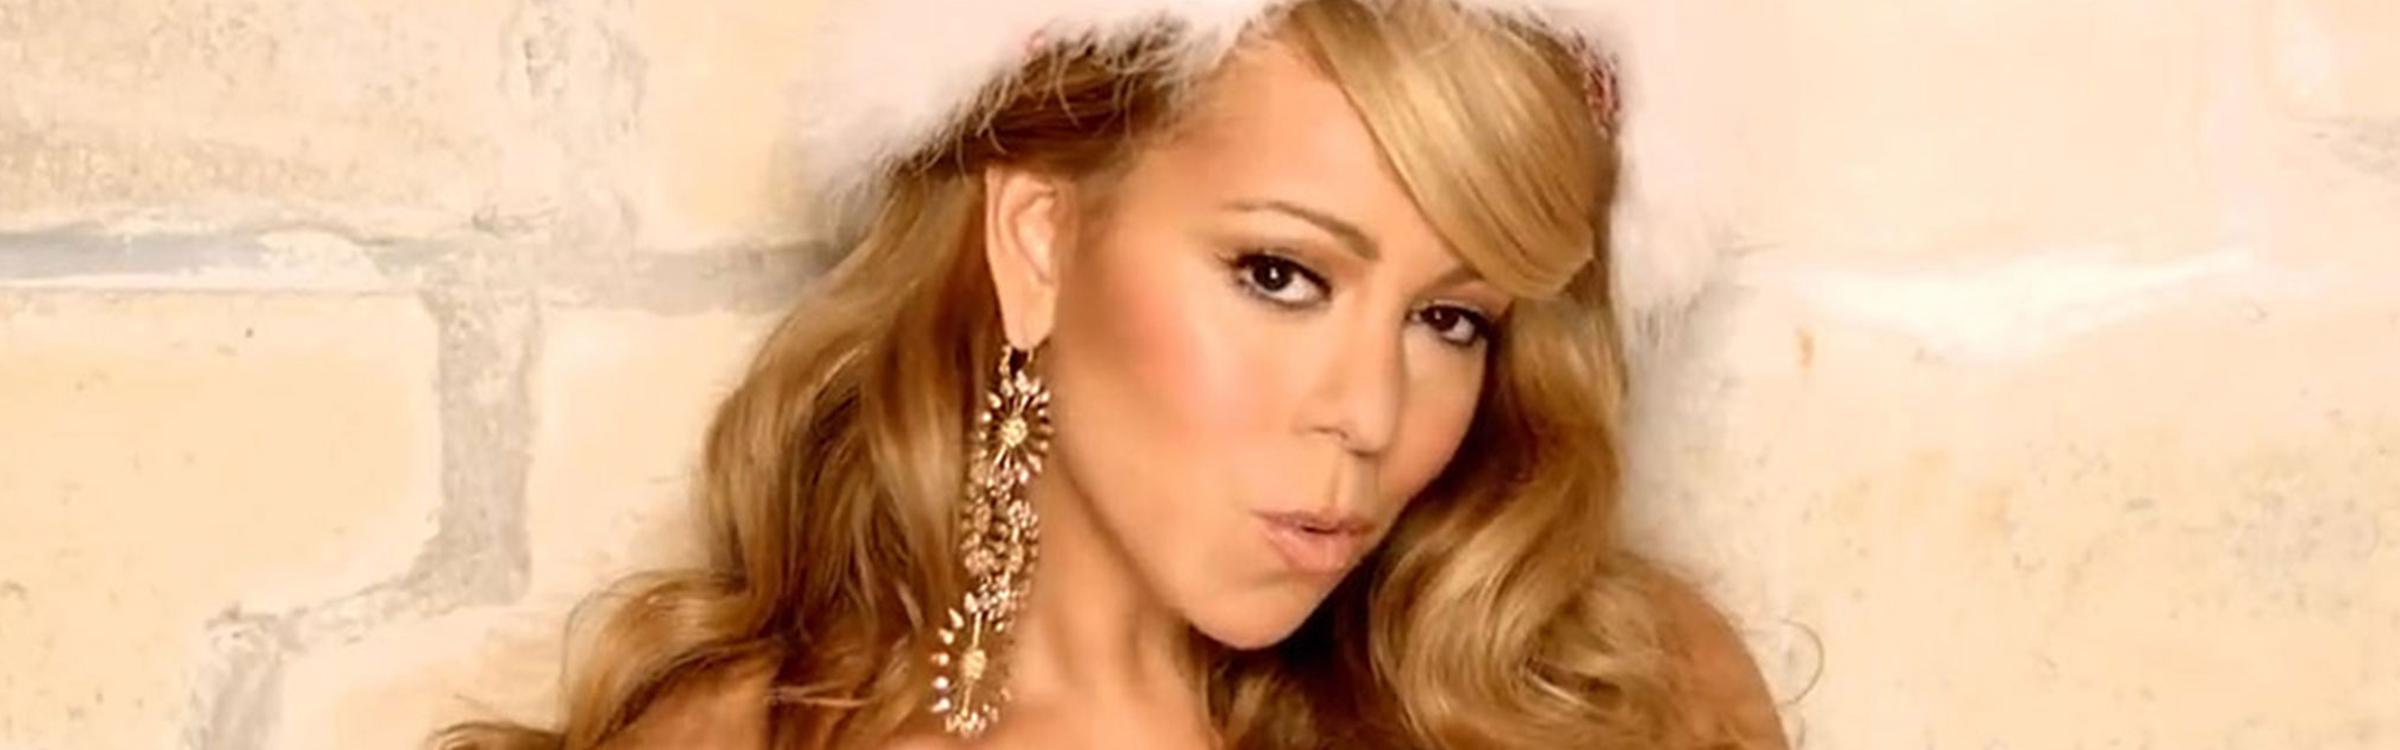 Mariah carey header deze